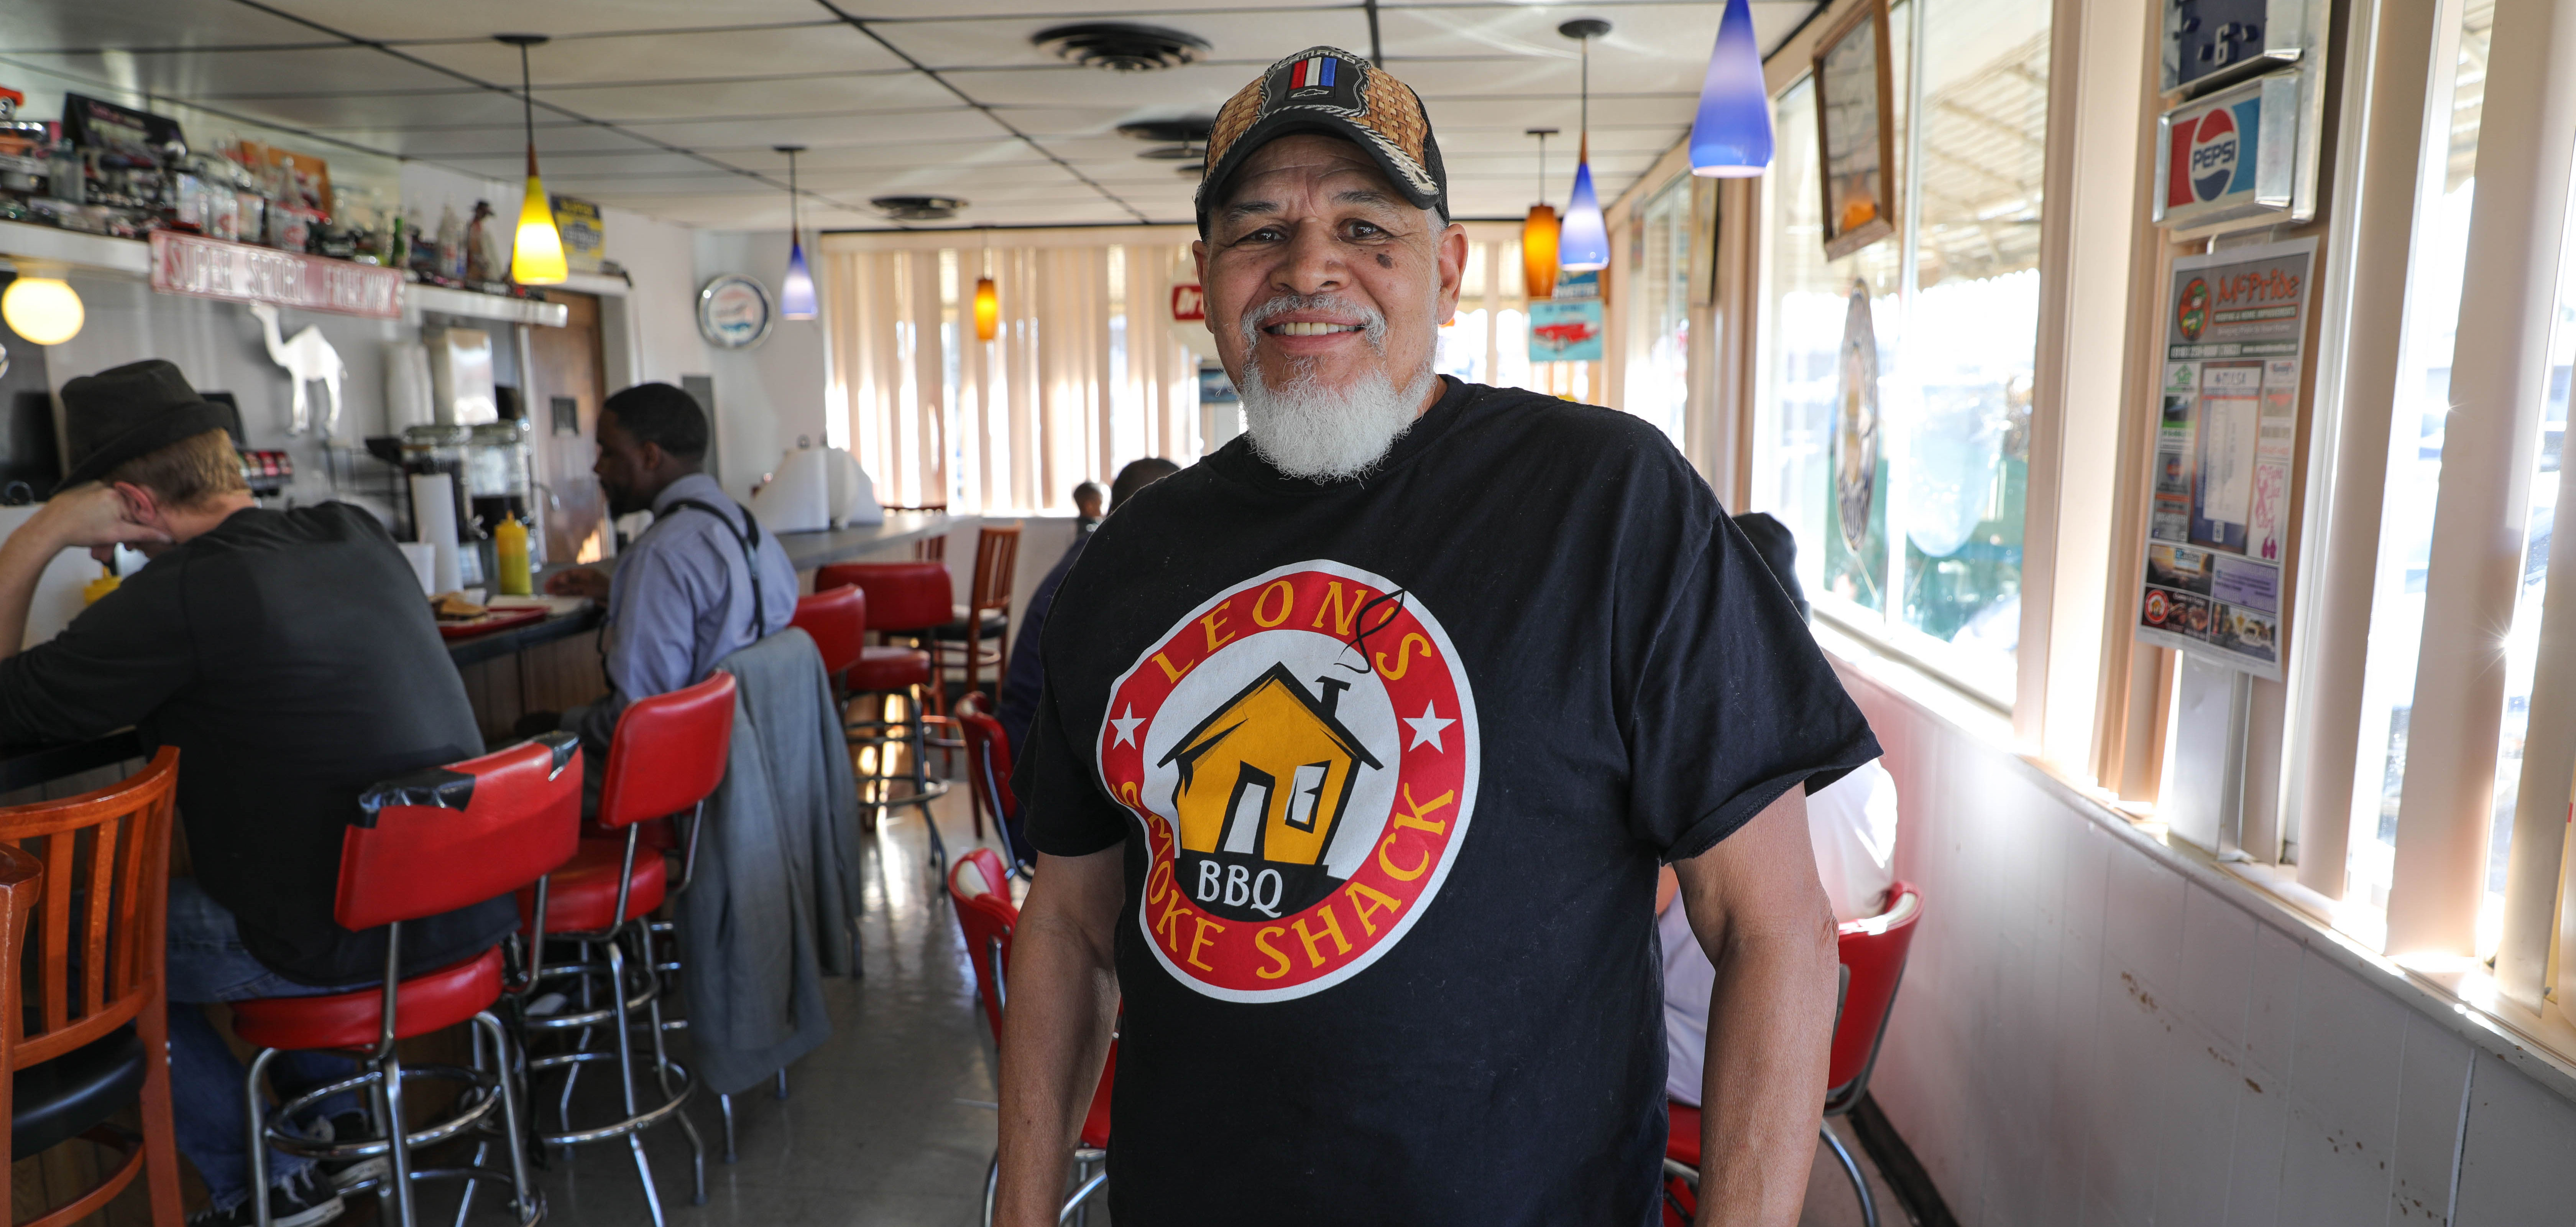 Owner Leon in his restaurant Leon's Smoke Shack in East Tulsa.